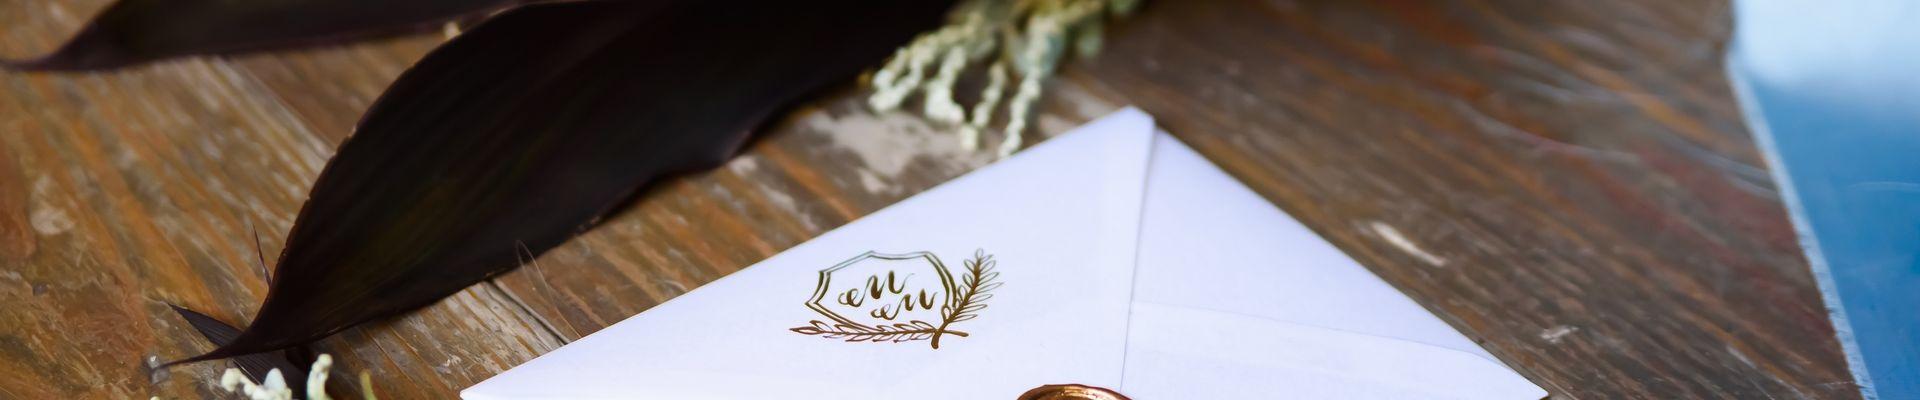 Papeterie Hochzeit, Hochzeitspapeterie, Hochzeitseinladung